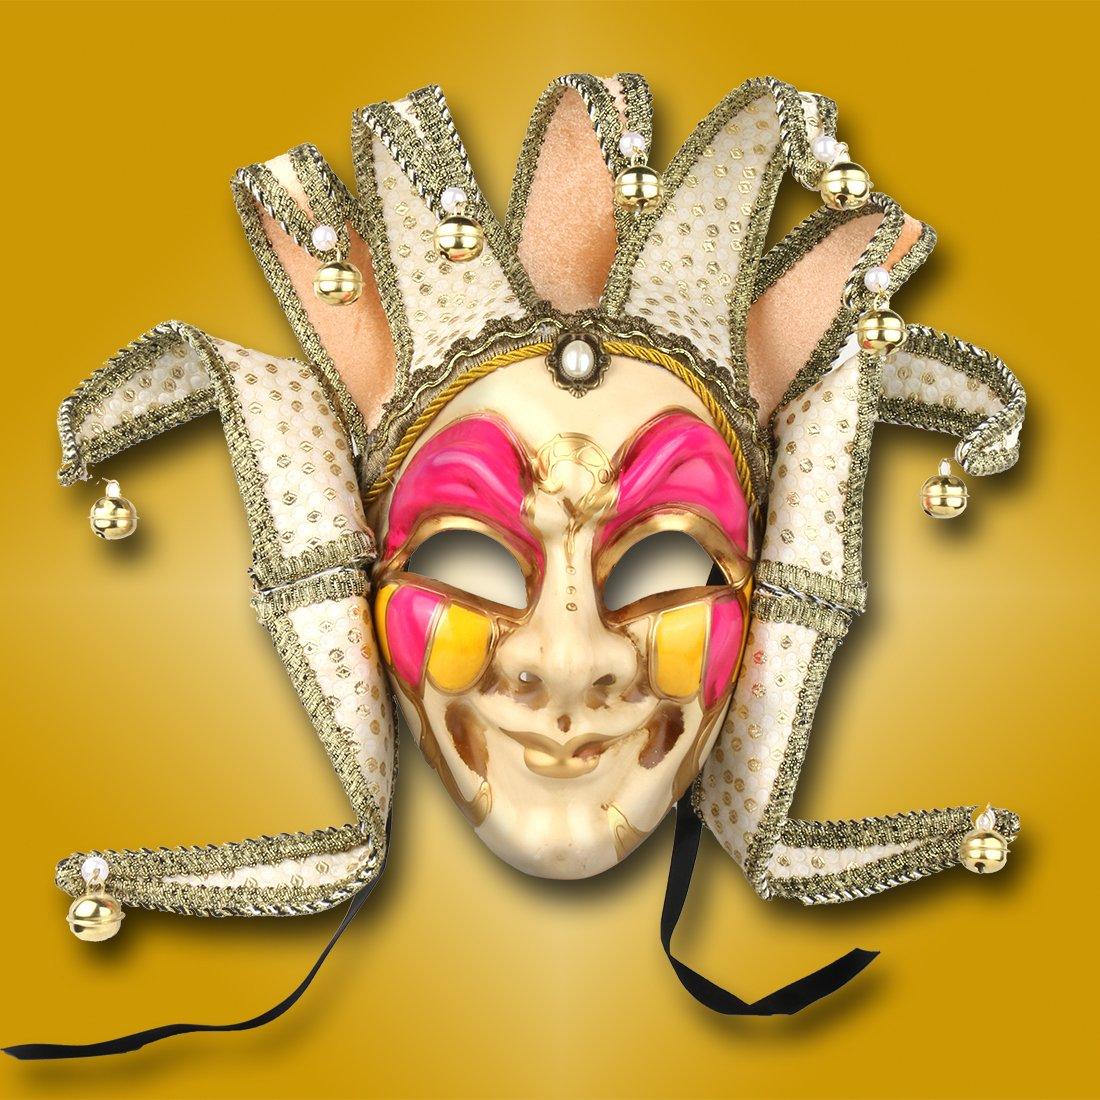 Amazon.com: YUFENG Jester Venetian Mask Masquerade Mardi Gras Wall ...